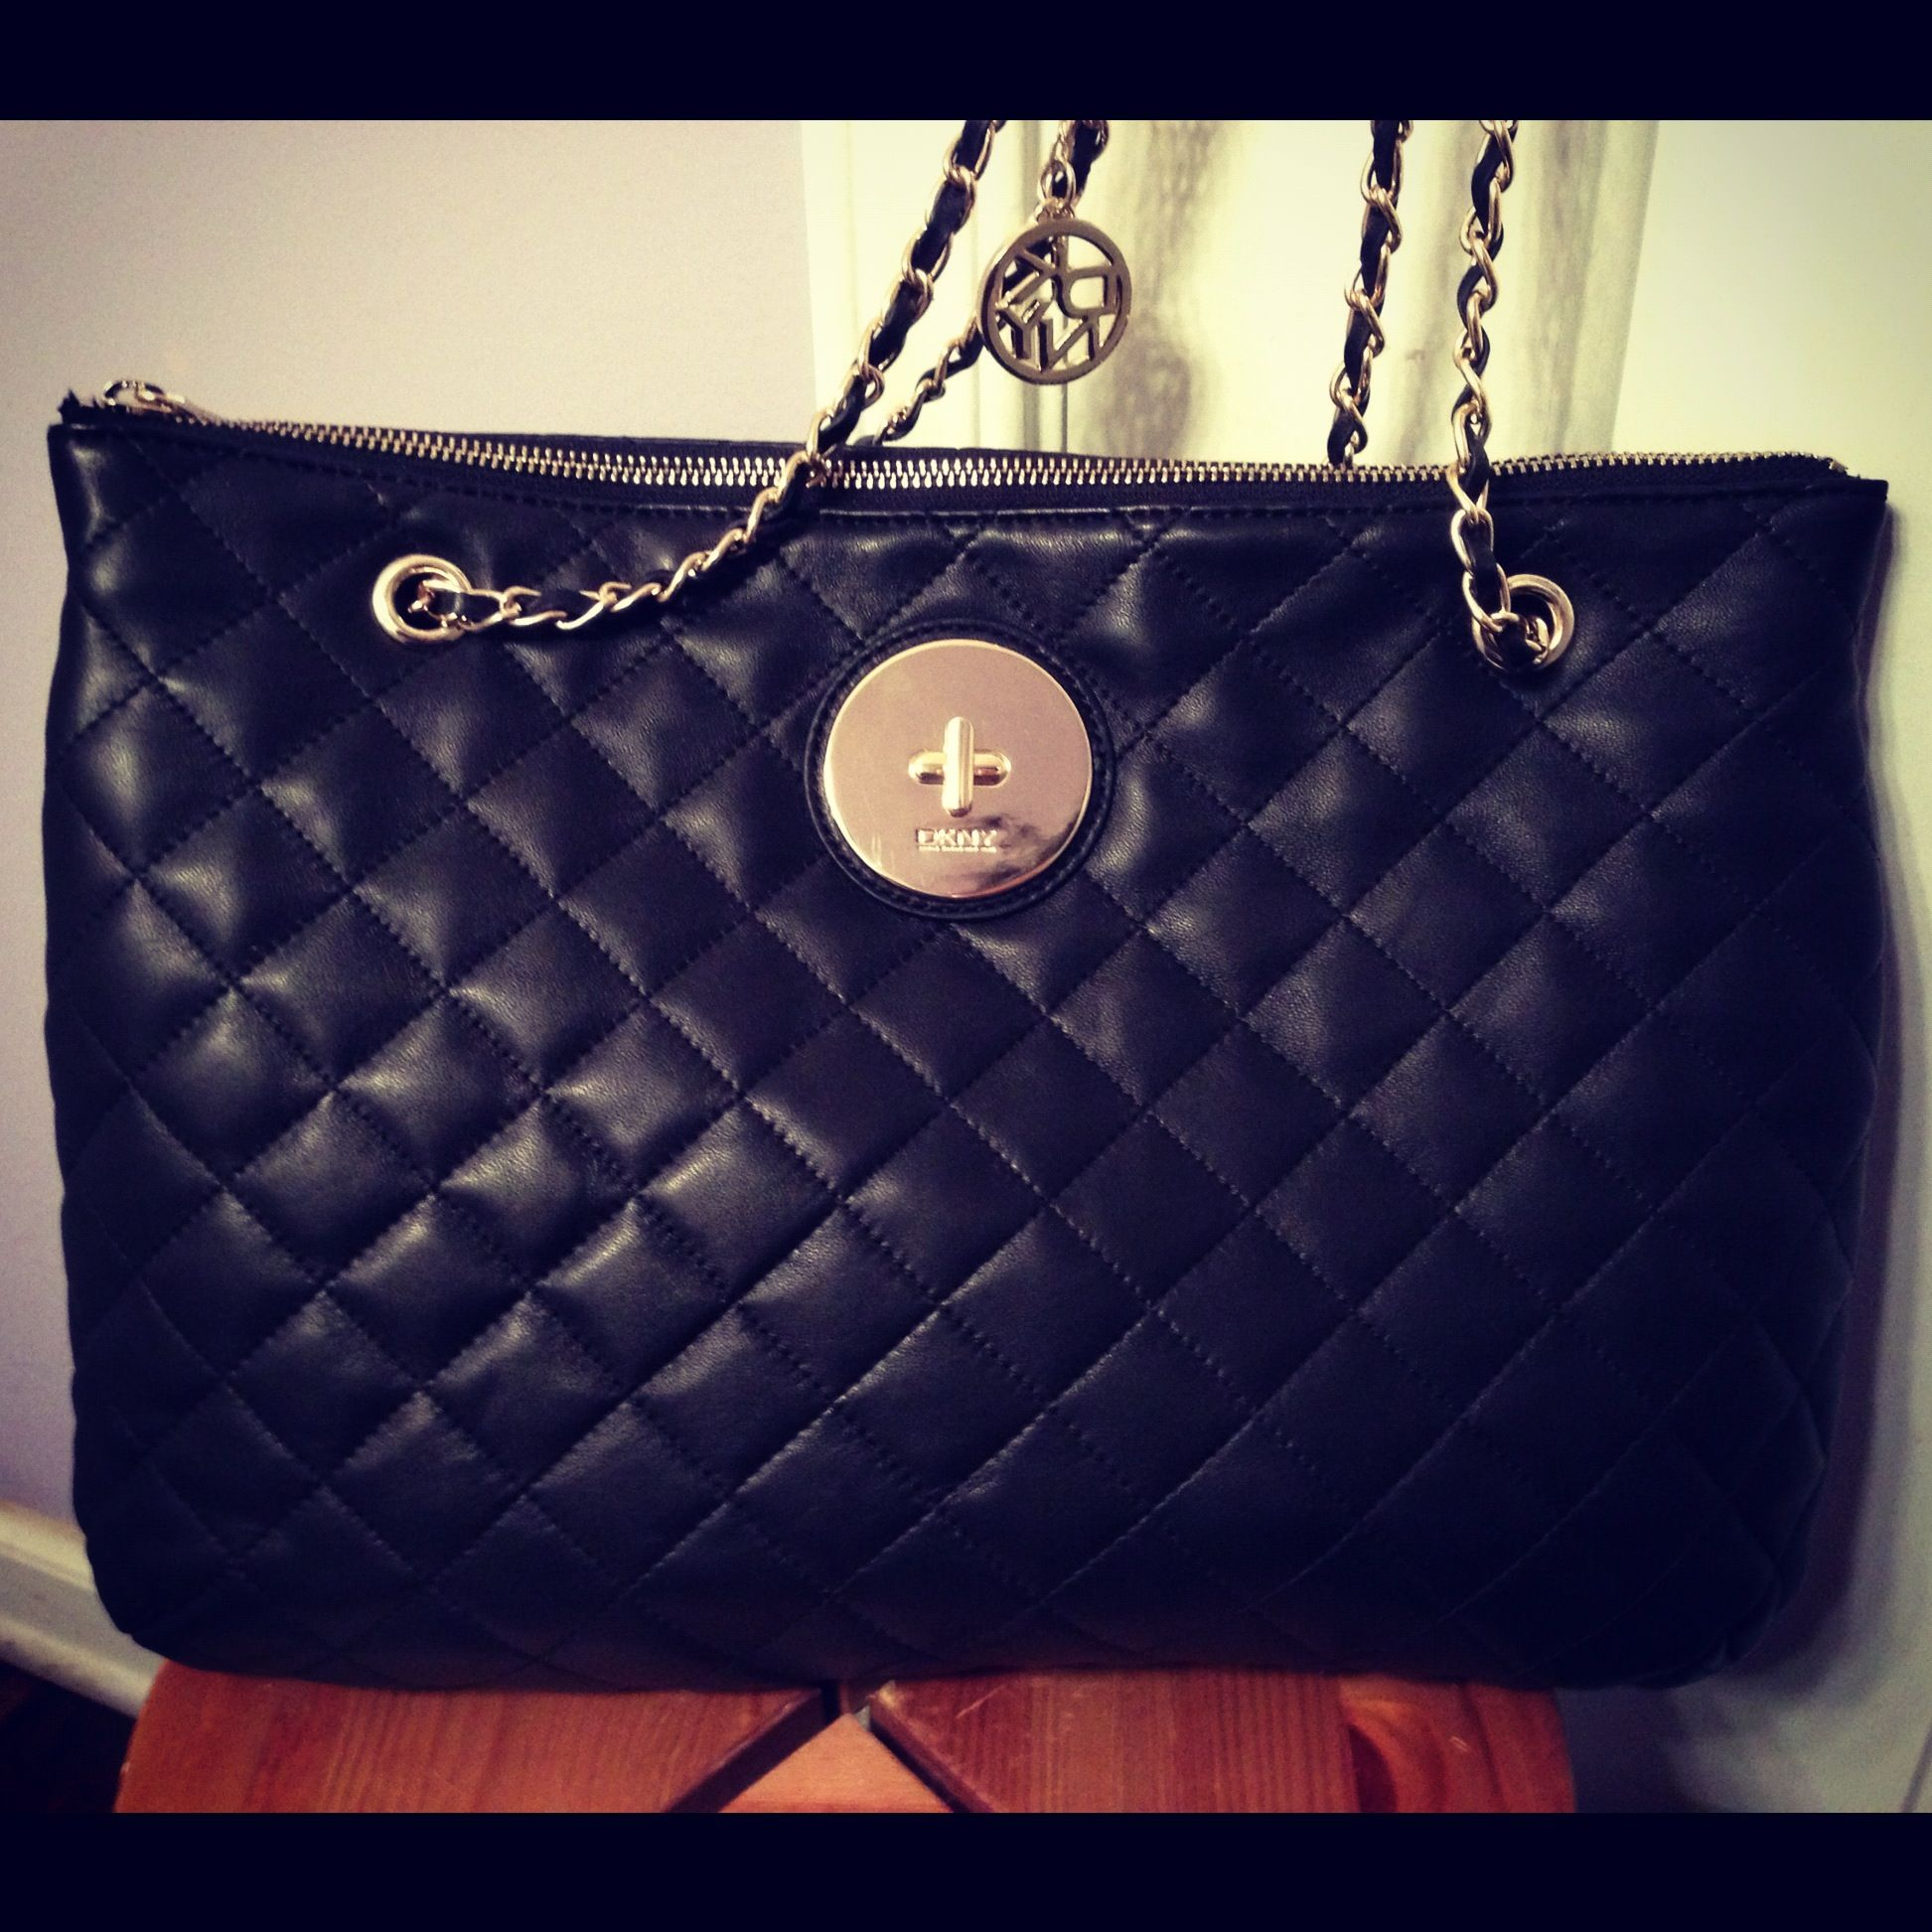 dkny quilted black bag. <3 <3 <3 | Accessorize | Pinterest | Bag ... : dkny black quilted handbag - Adamdwight.com